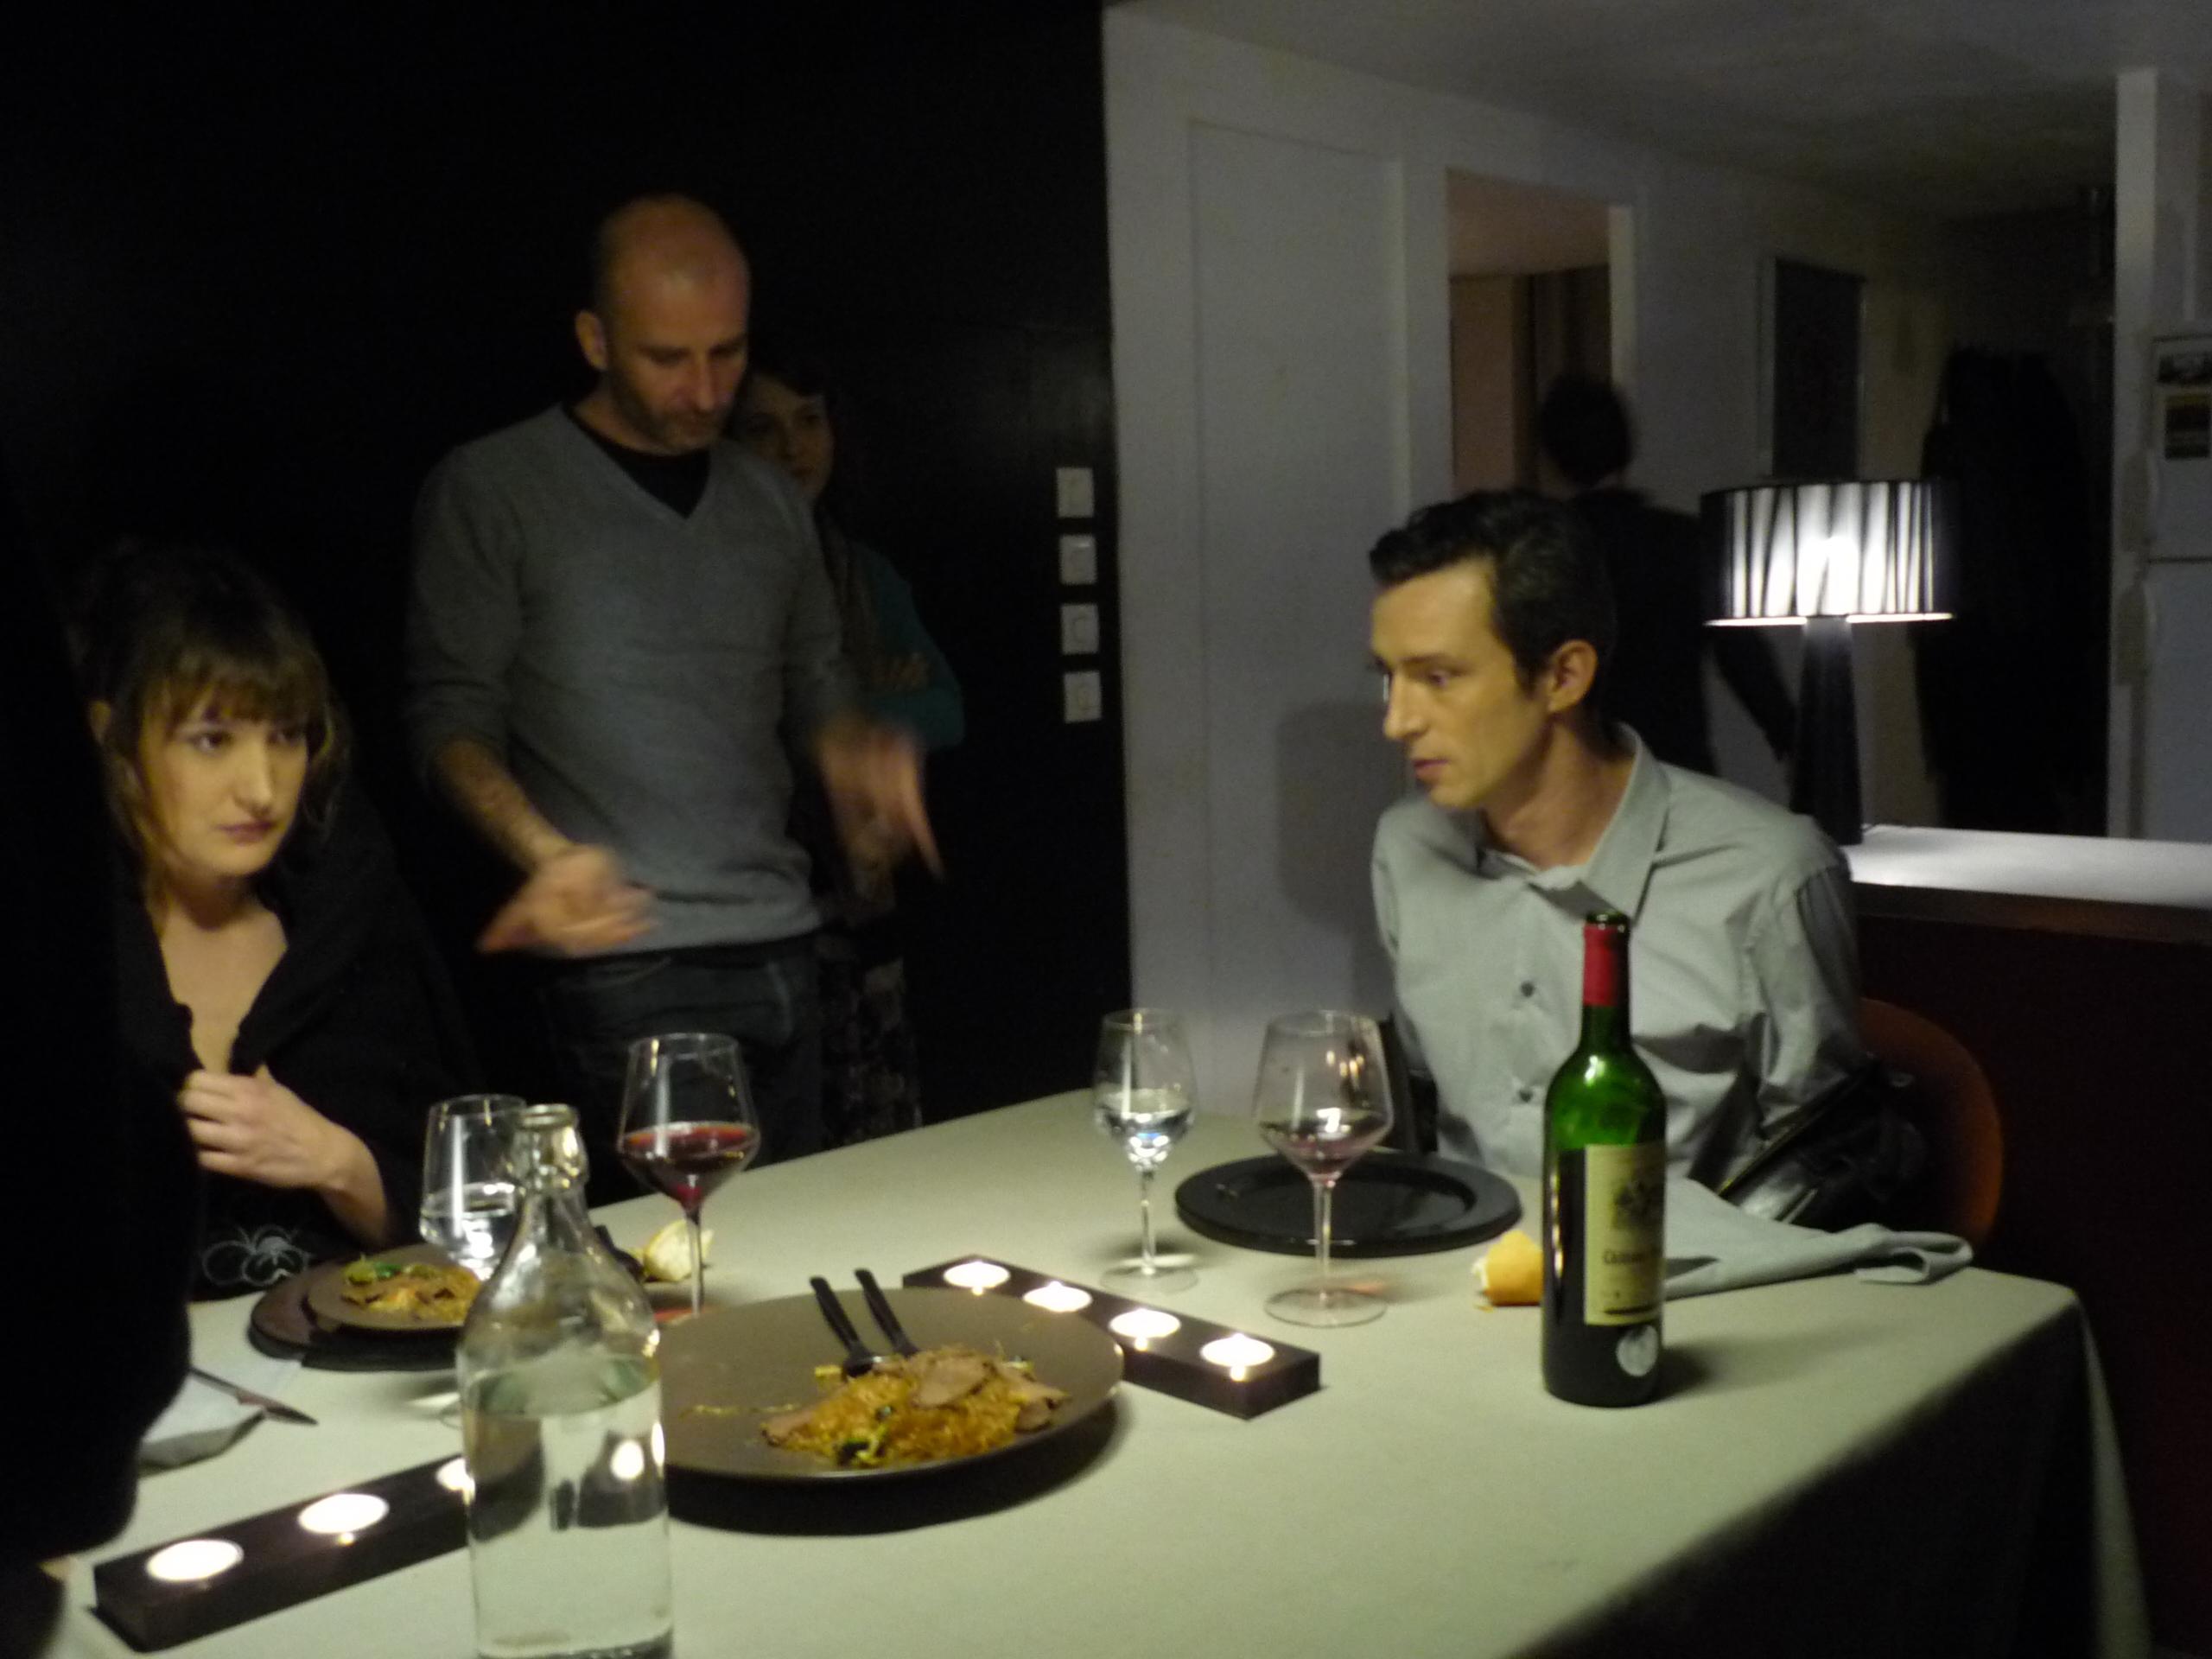 Chambre noire film review kiyoshi kurosawa s daguerrotype for Chambre 13 film